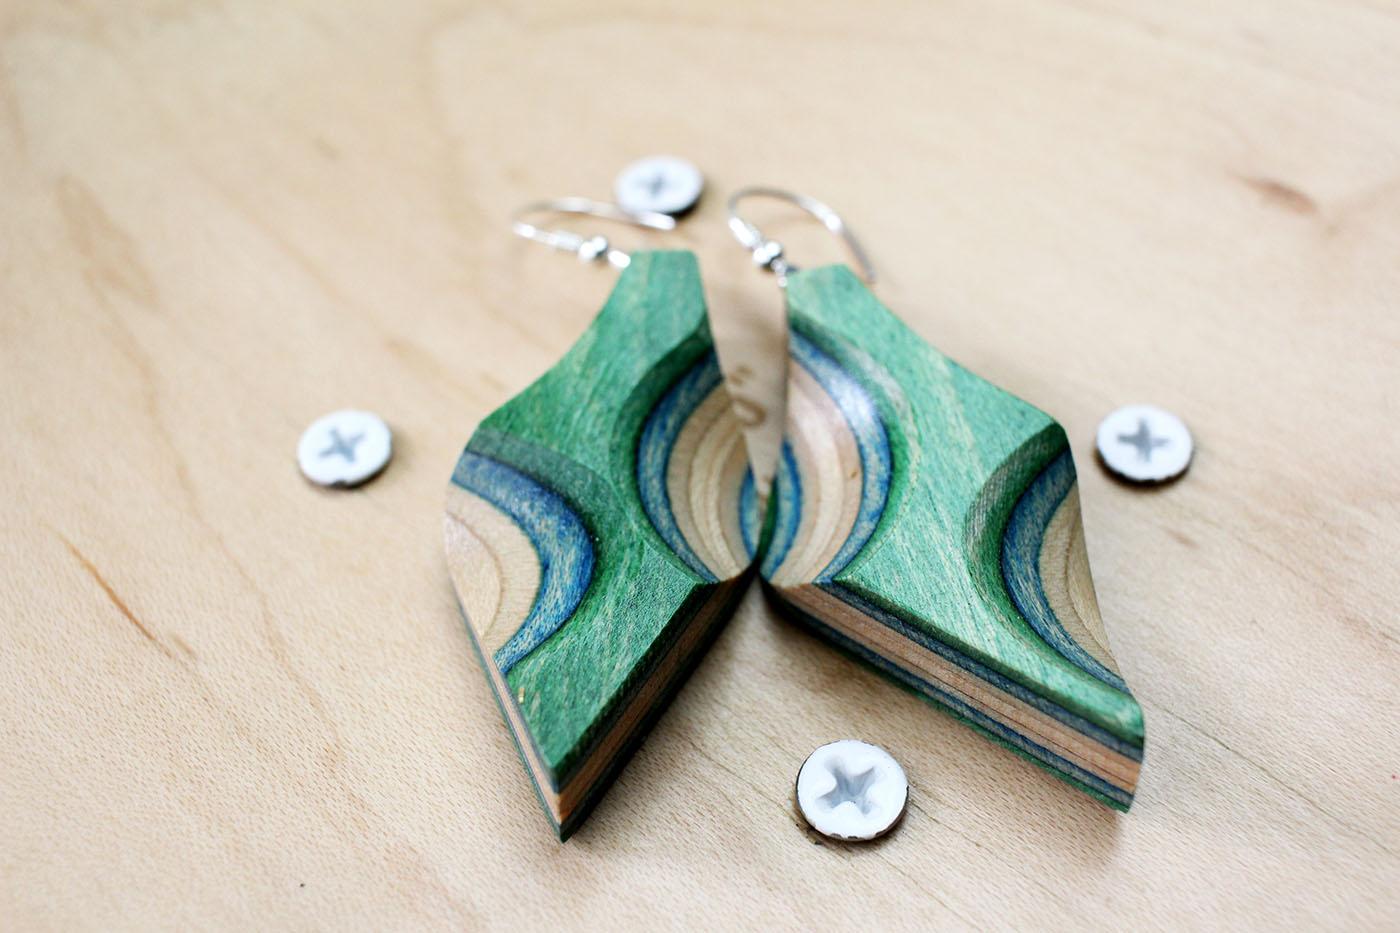 earrings special edition skatan llc11